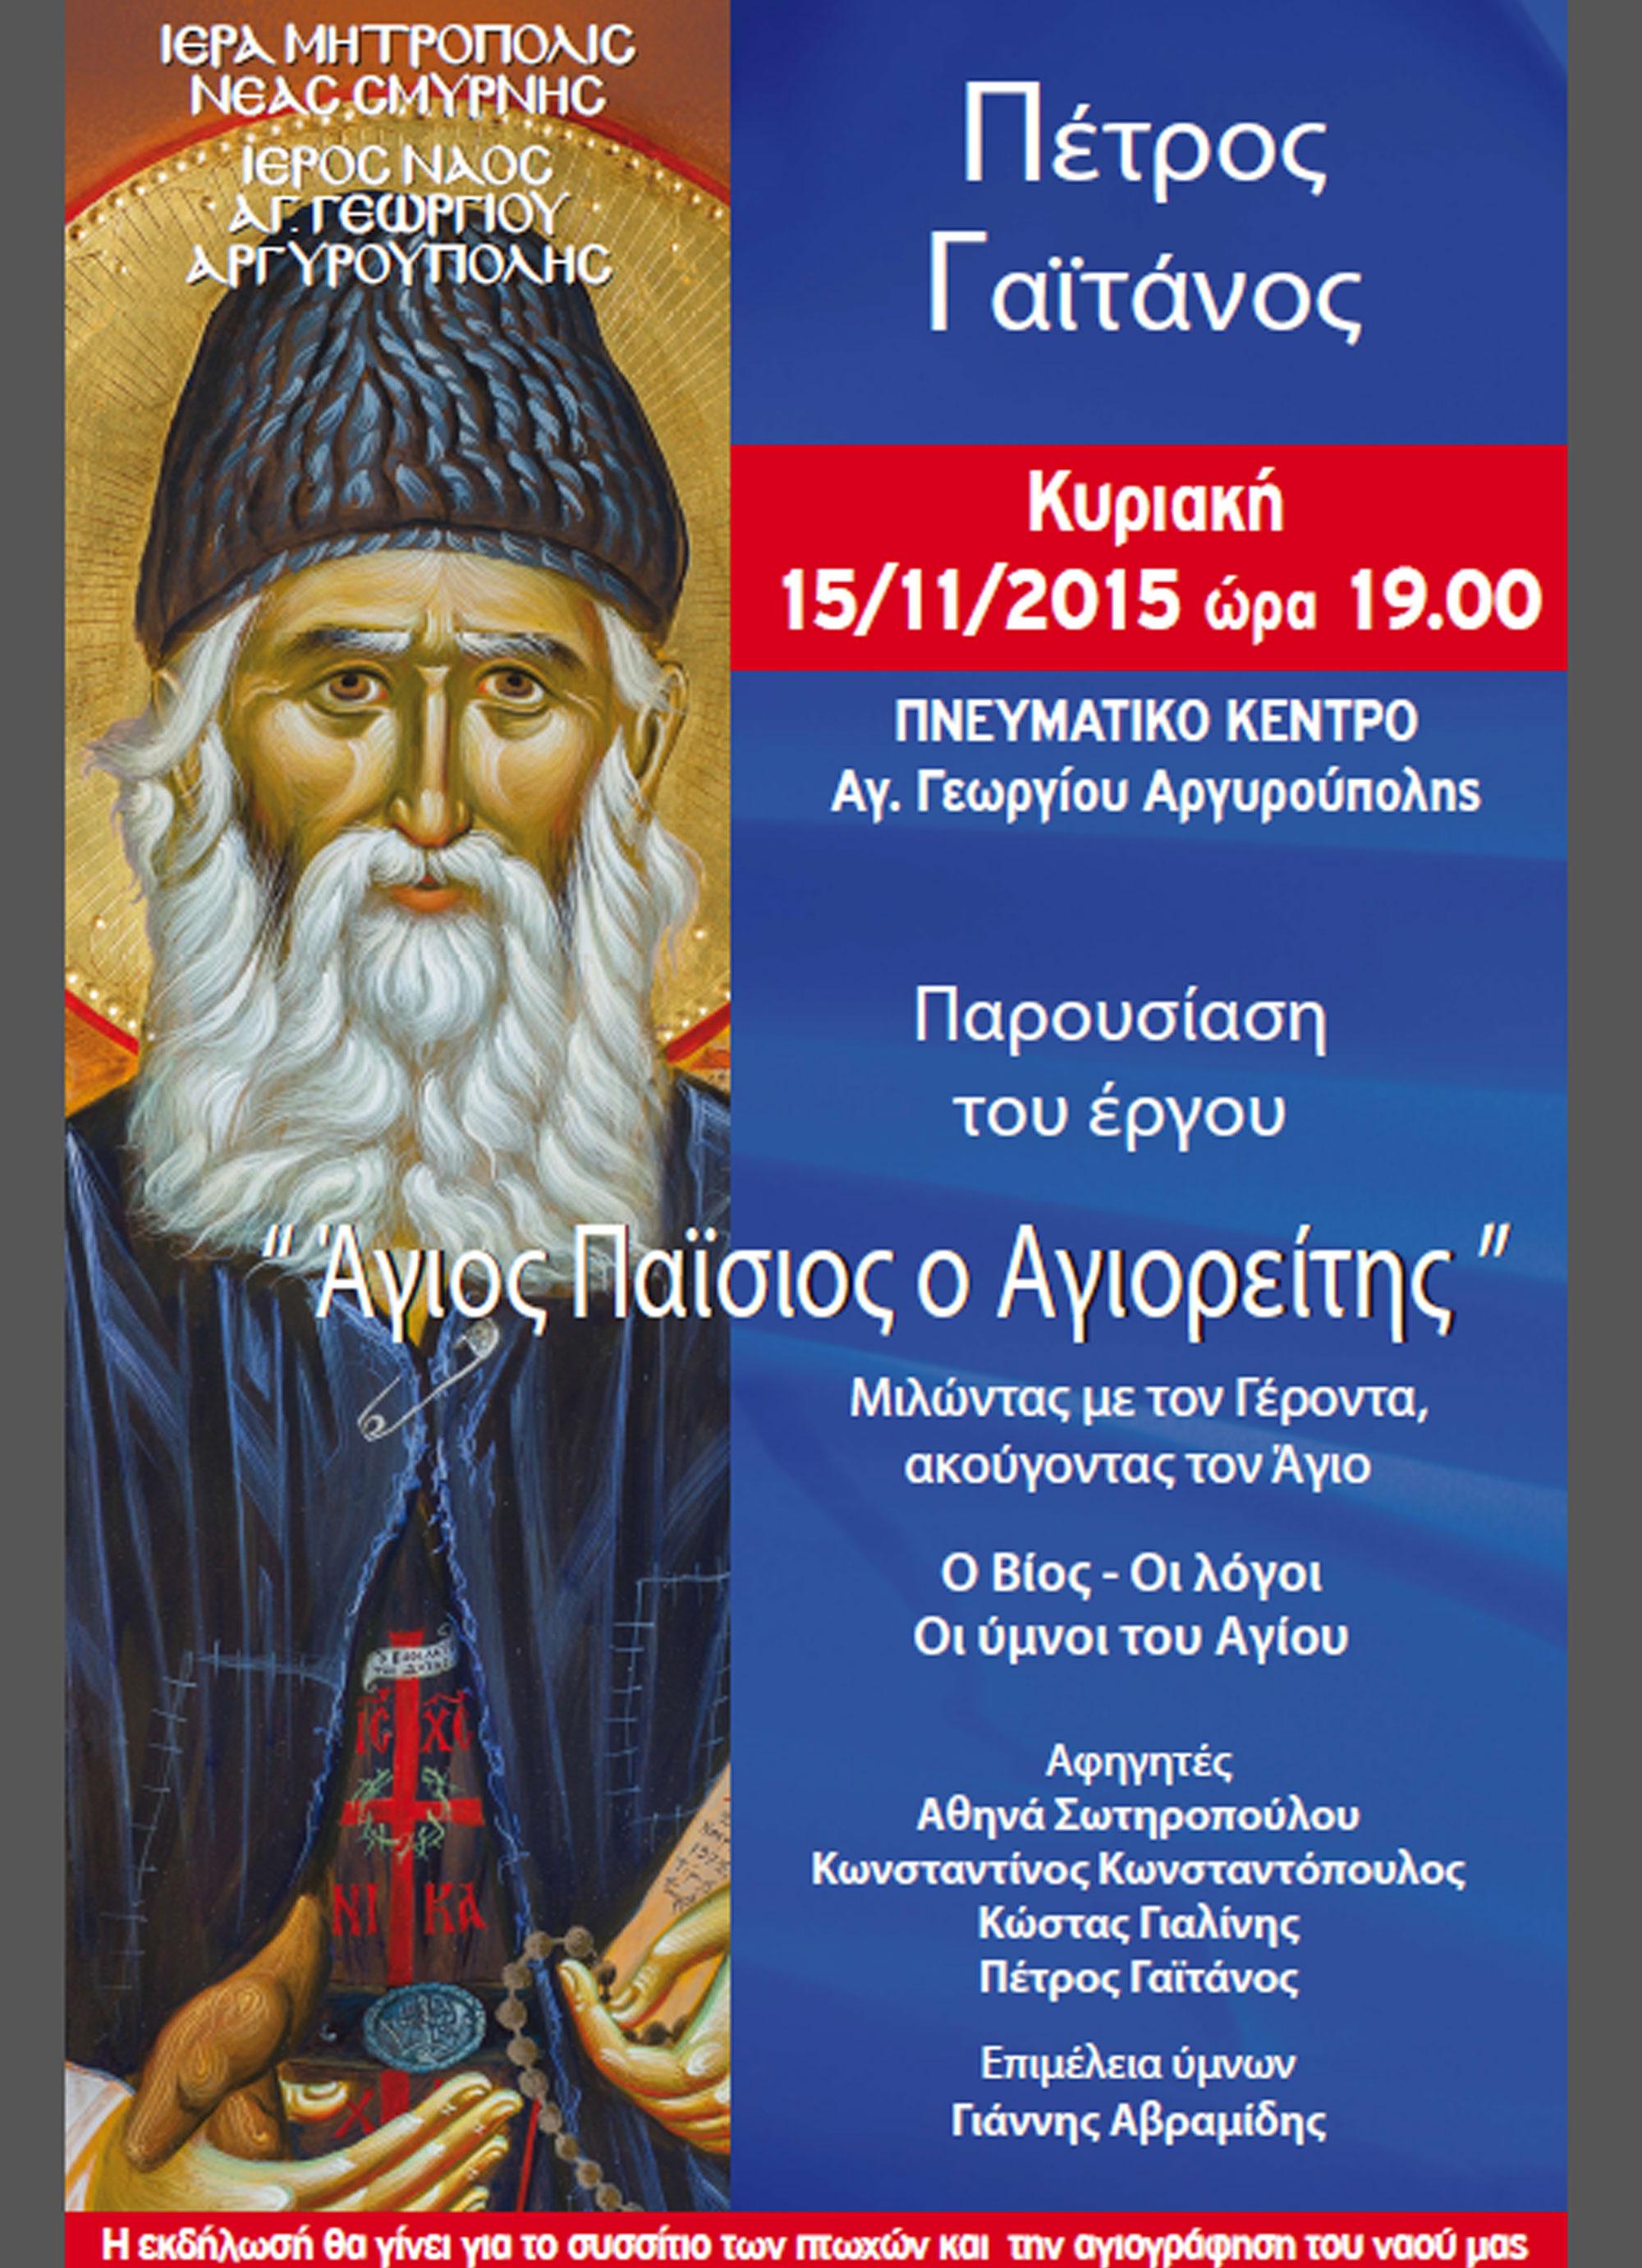 agios georgios argirupolis athinon 15 11 15